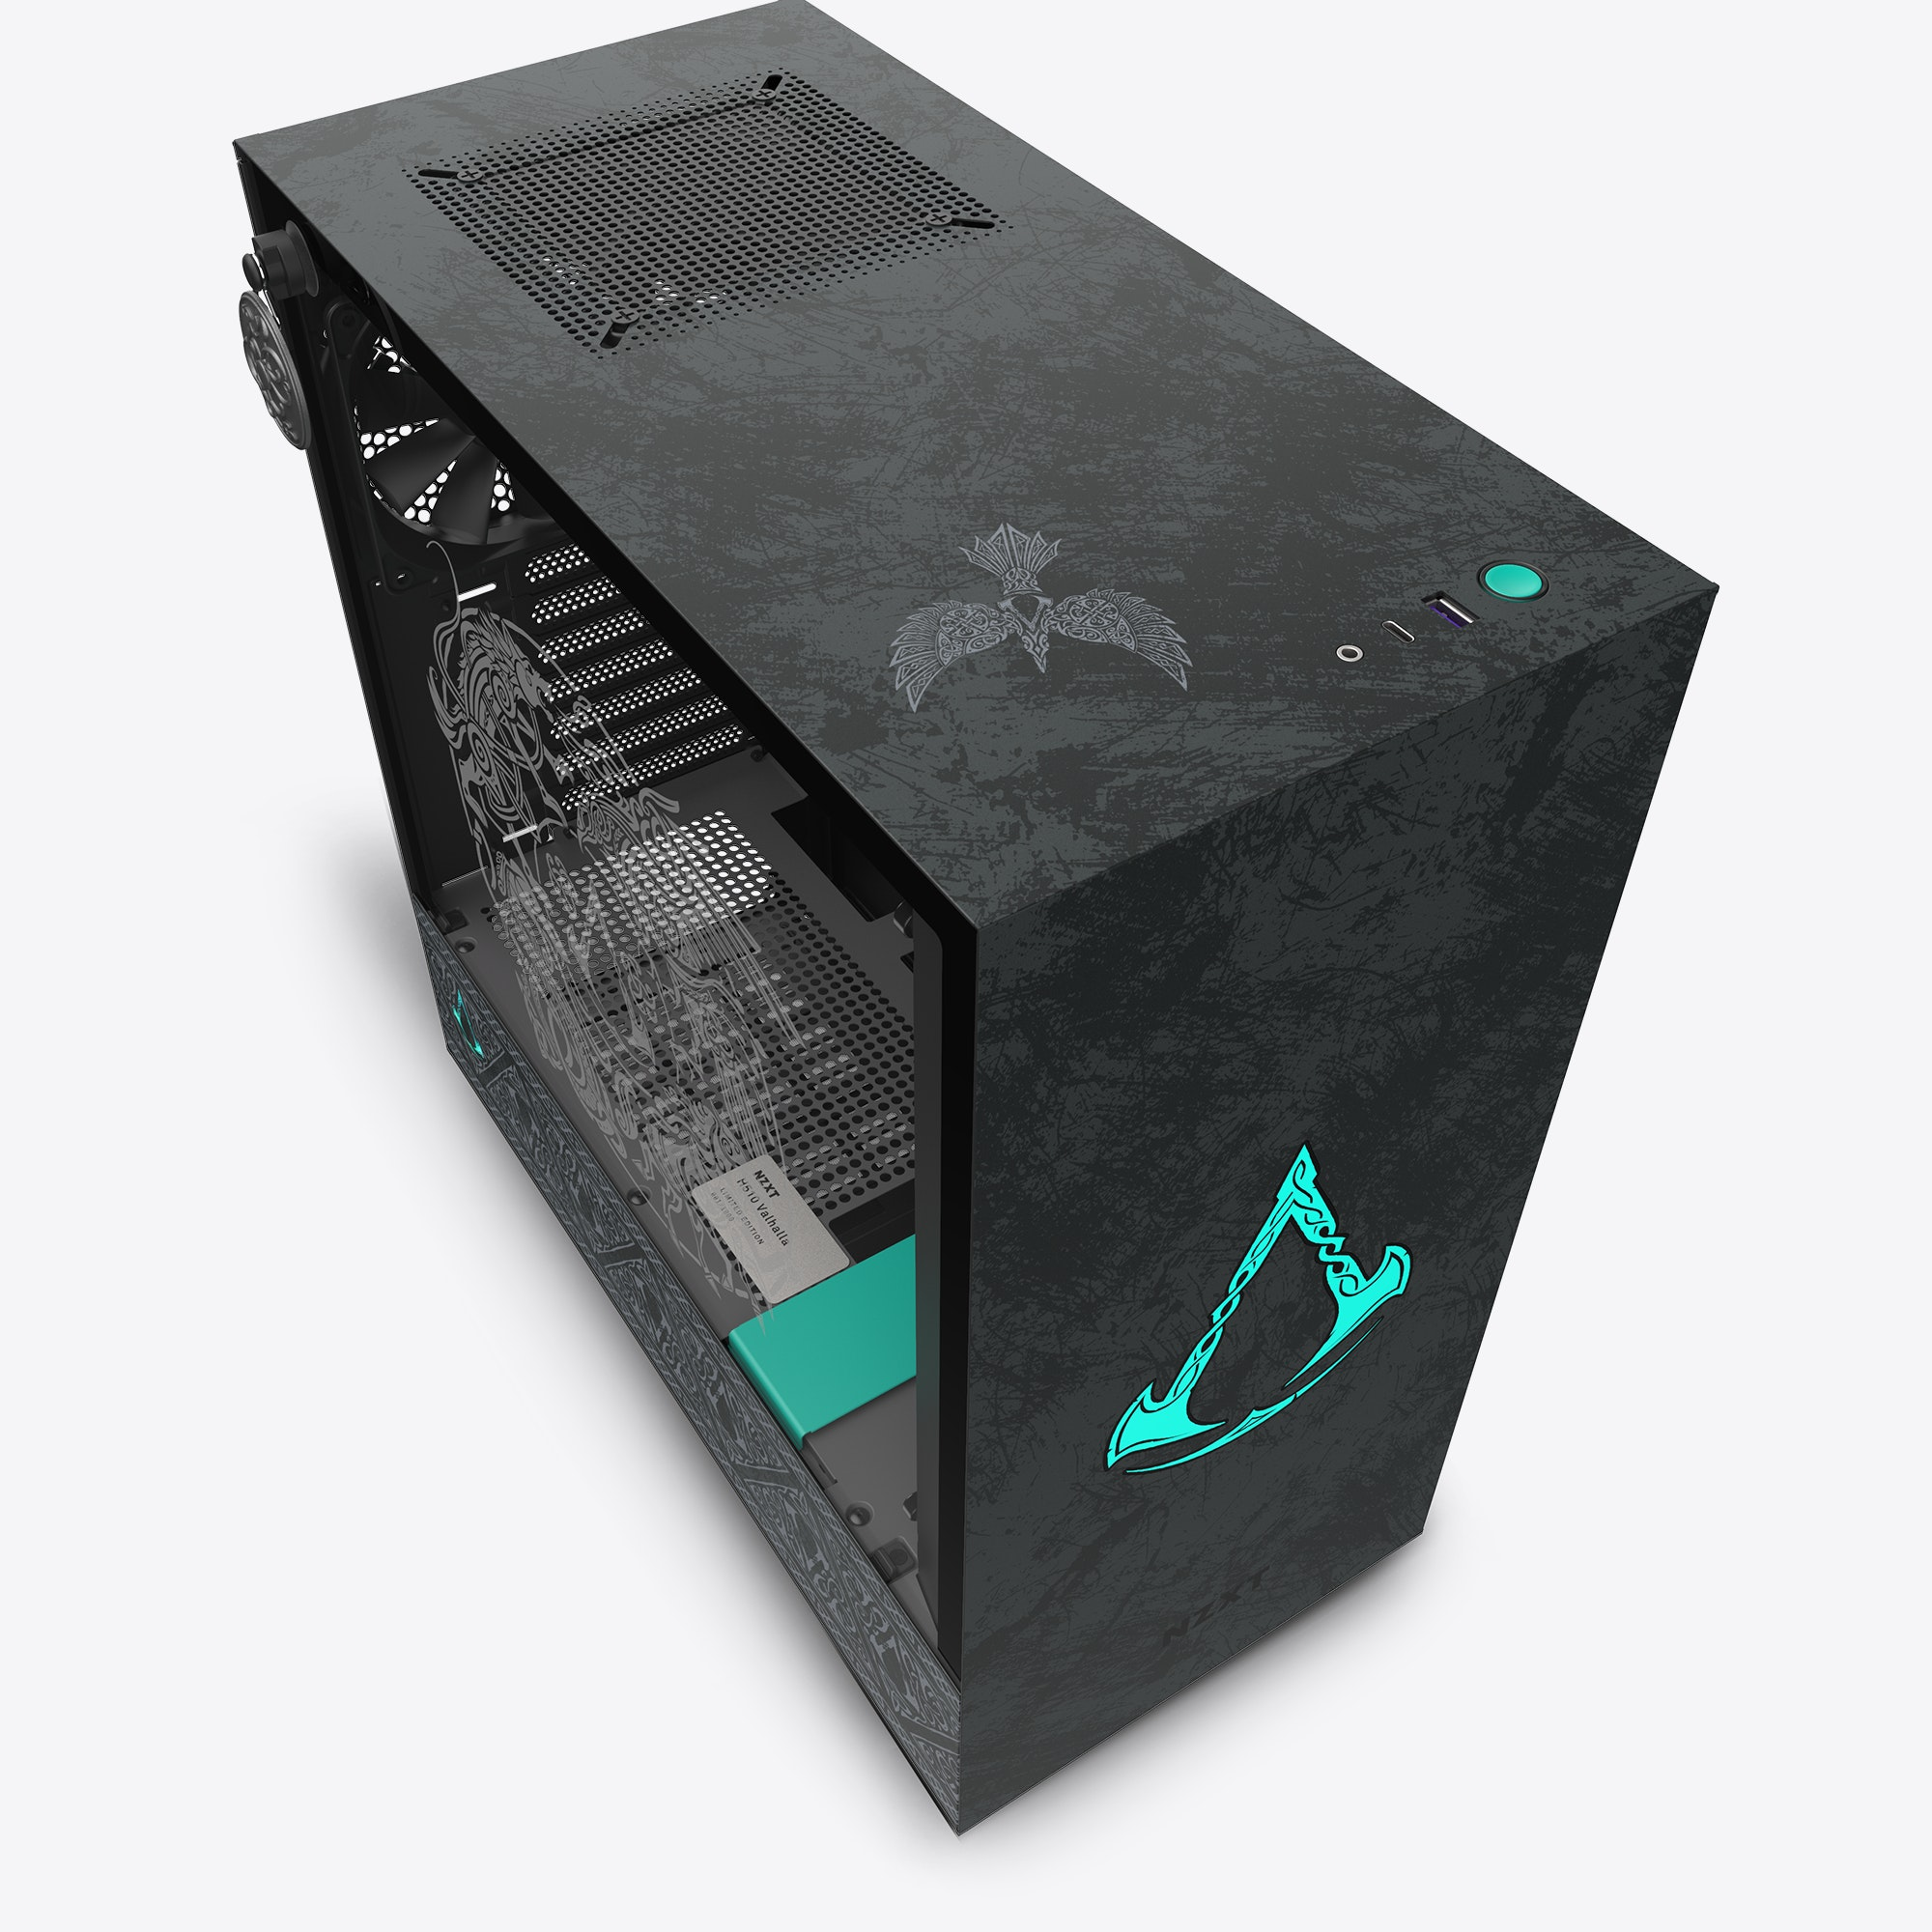 NZXT выпустила корпус H510 для фанатов Assassin's Creed Valhalla